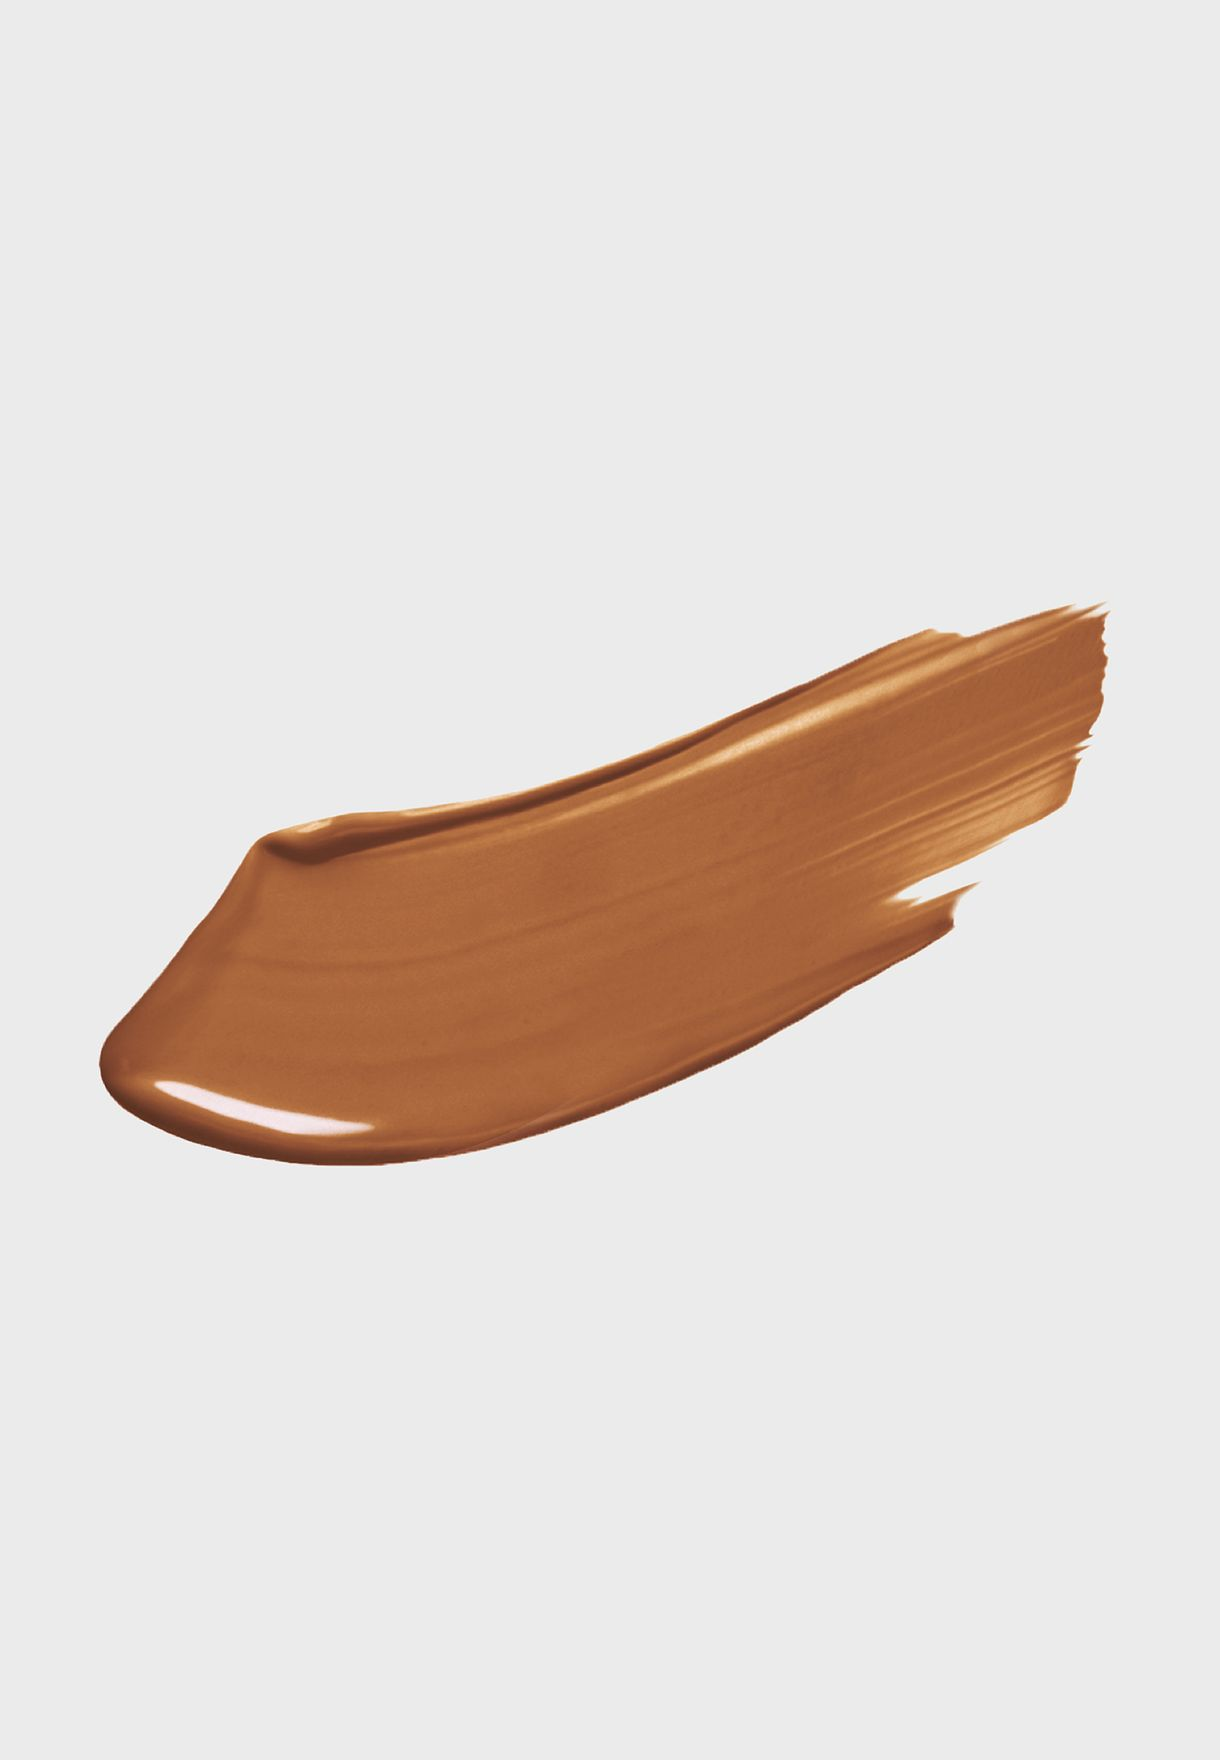 Ultra High Definition Concealer 51 Tawny